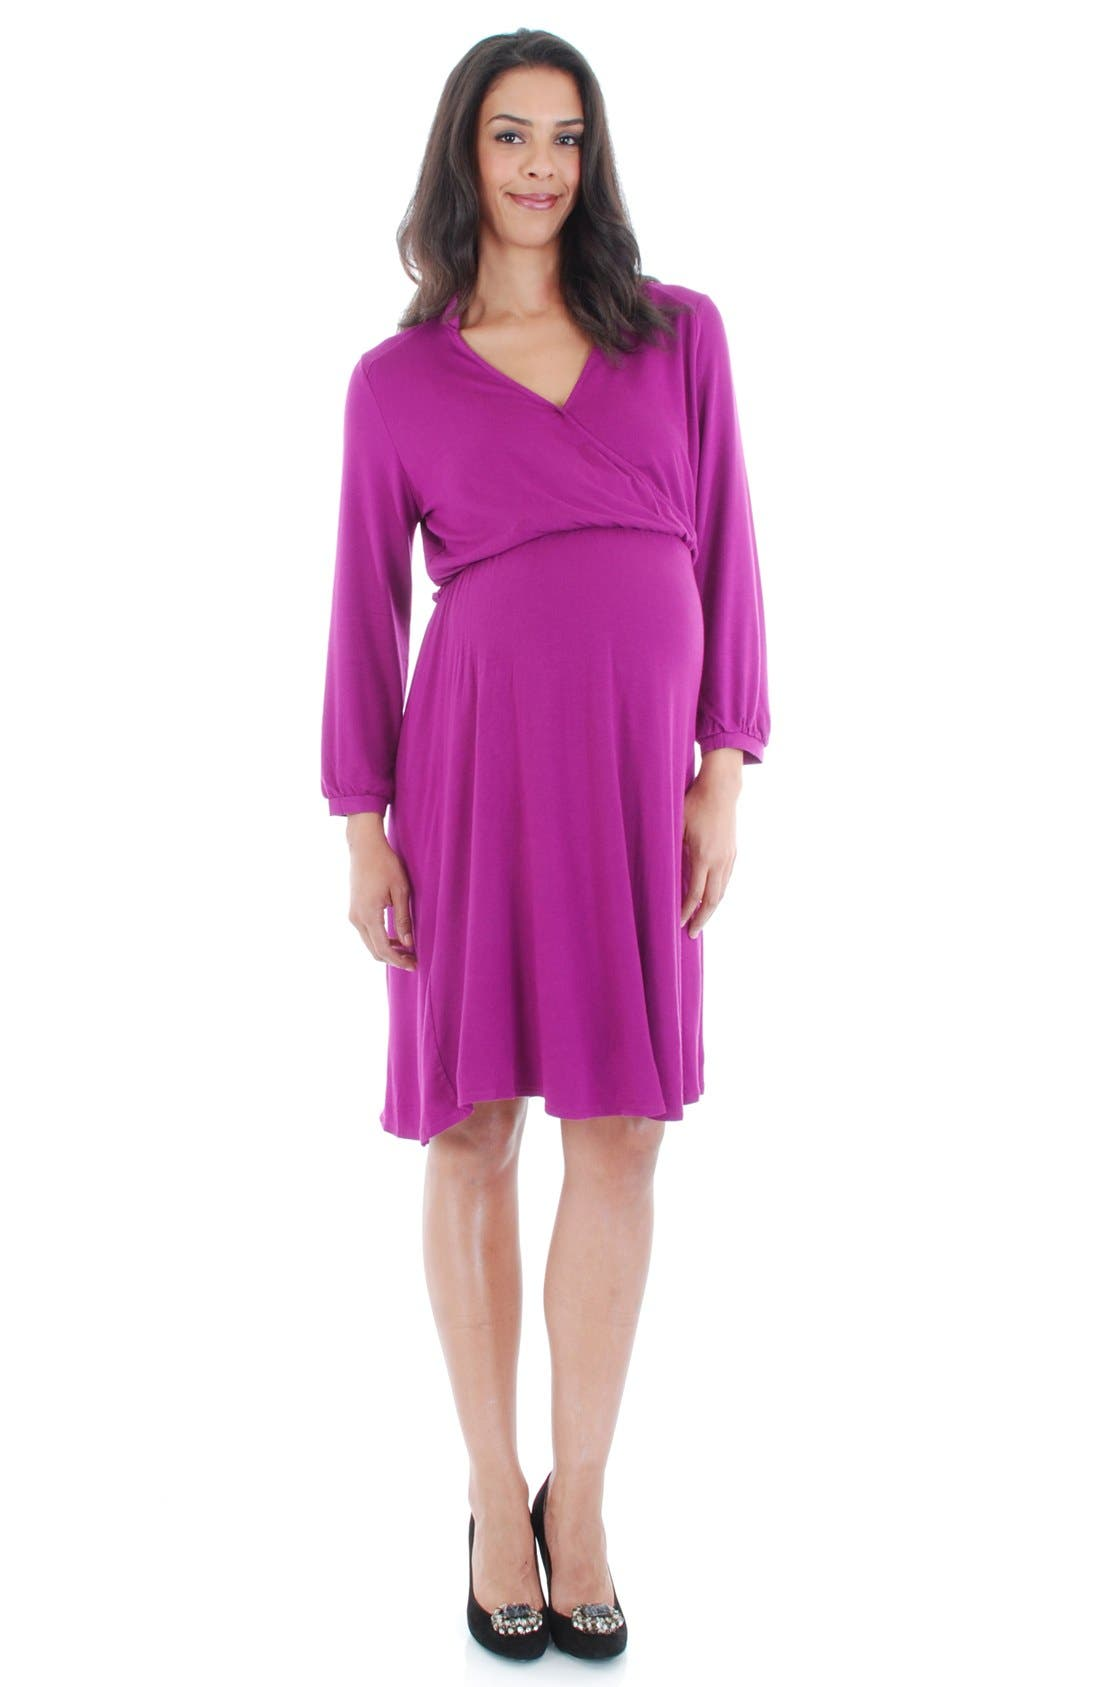 EverlyGrey 'Sicily' Maternity/Nursing Dress,                             Main thumbnail 1, color,